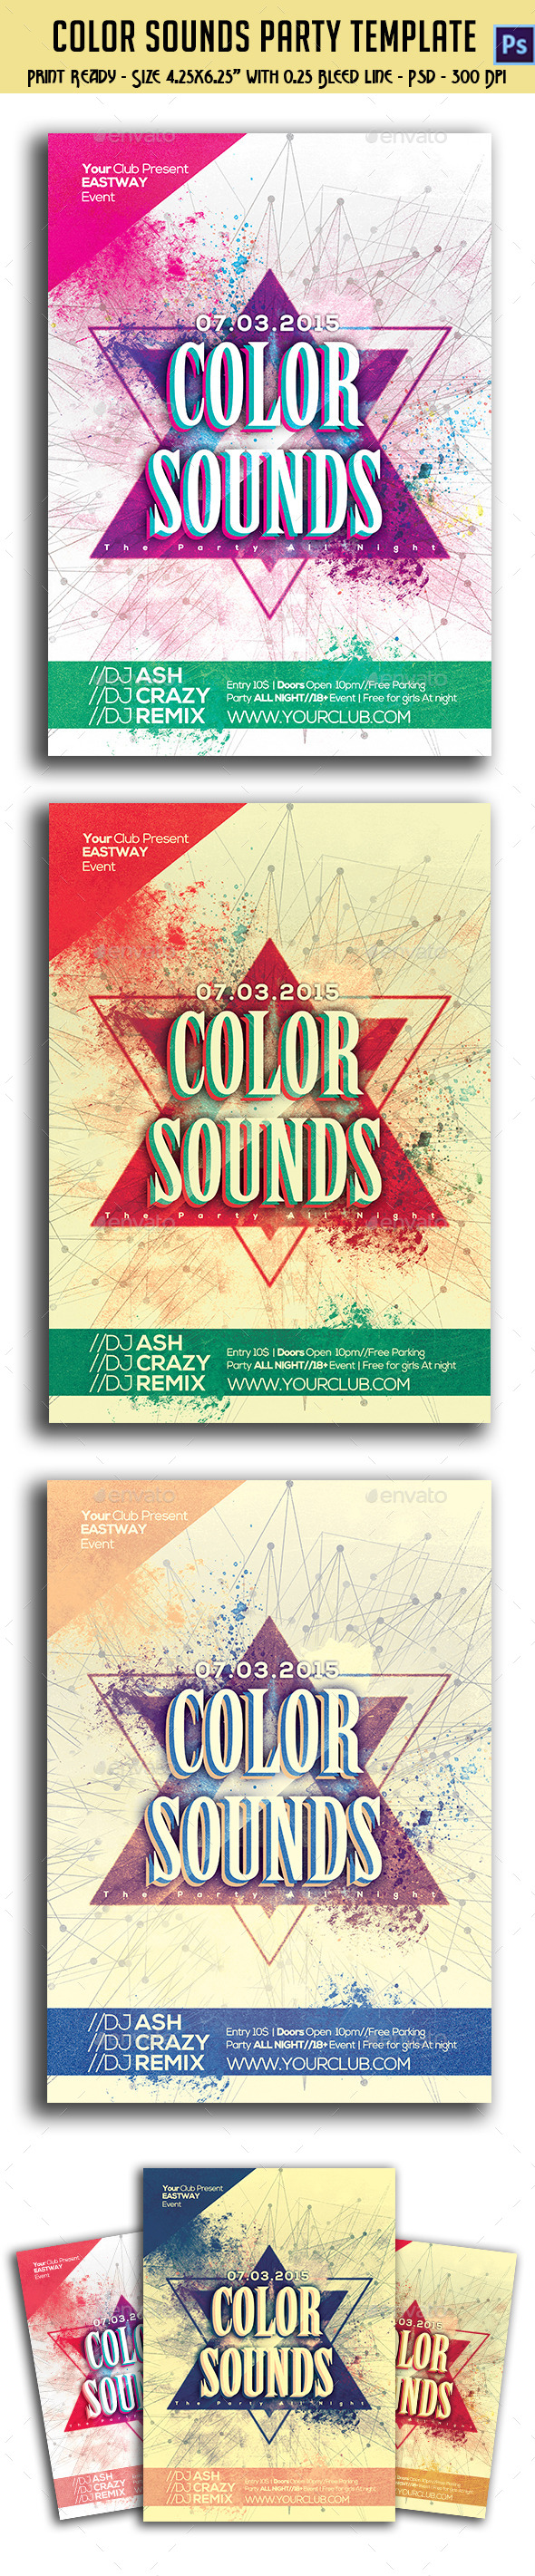 GraphicRiver Color Sounds Party Flyer 10764090